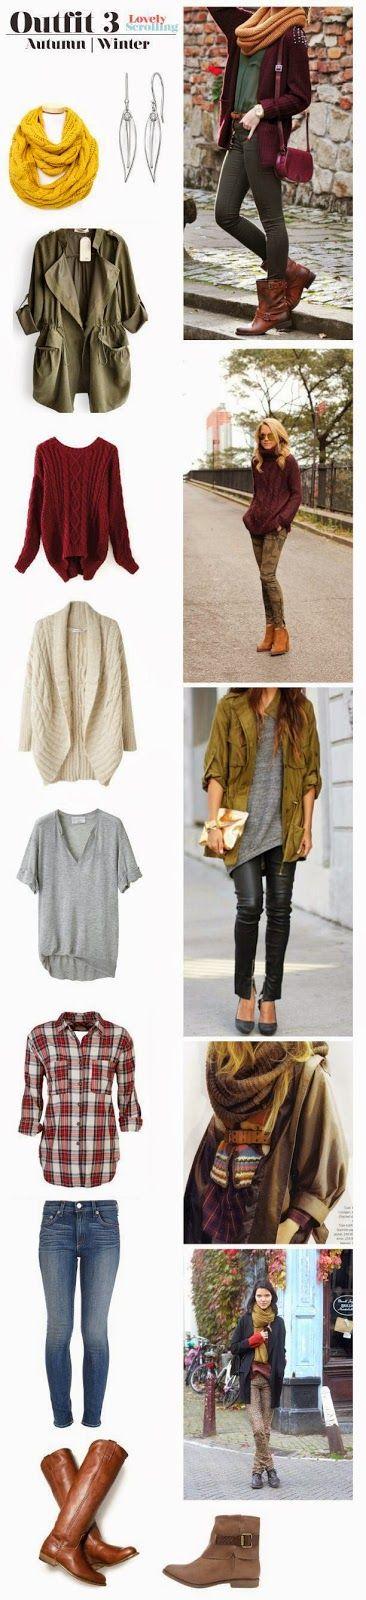 //Fall #fashion #street style #womenswear #accessories